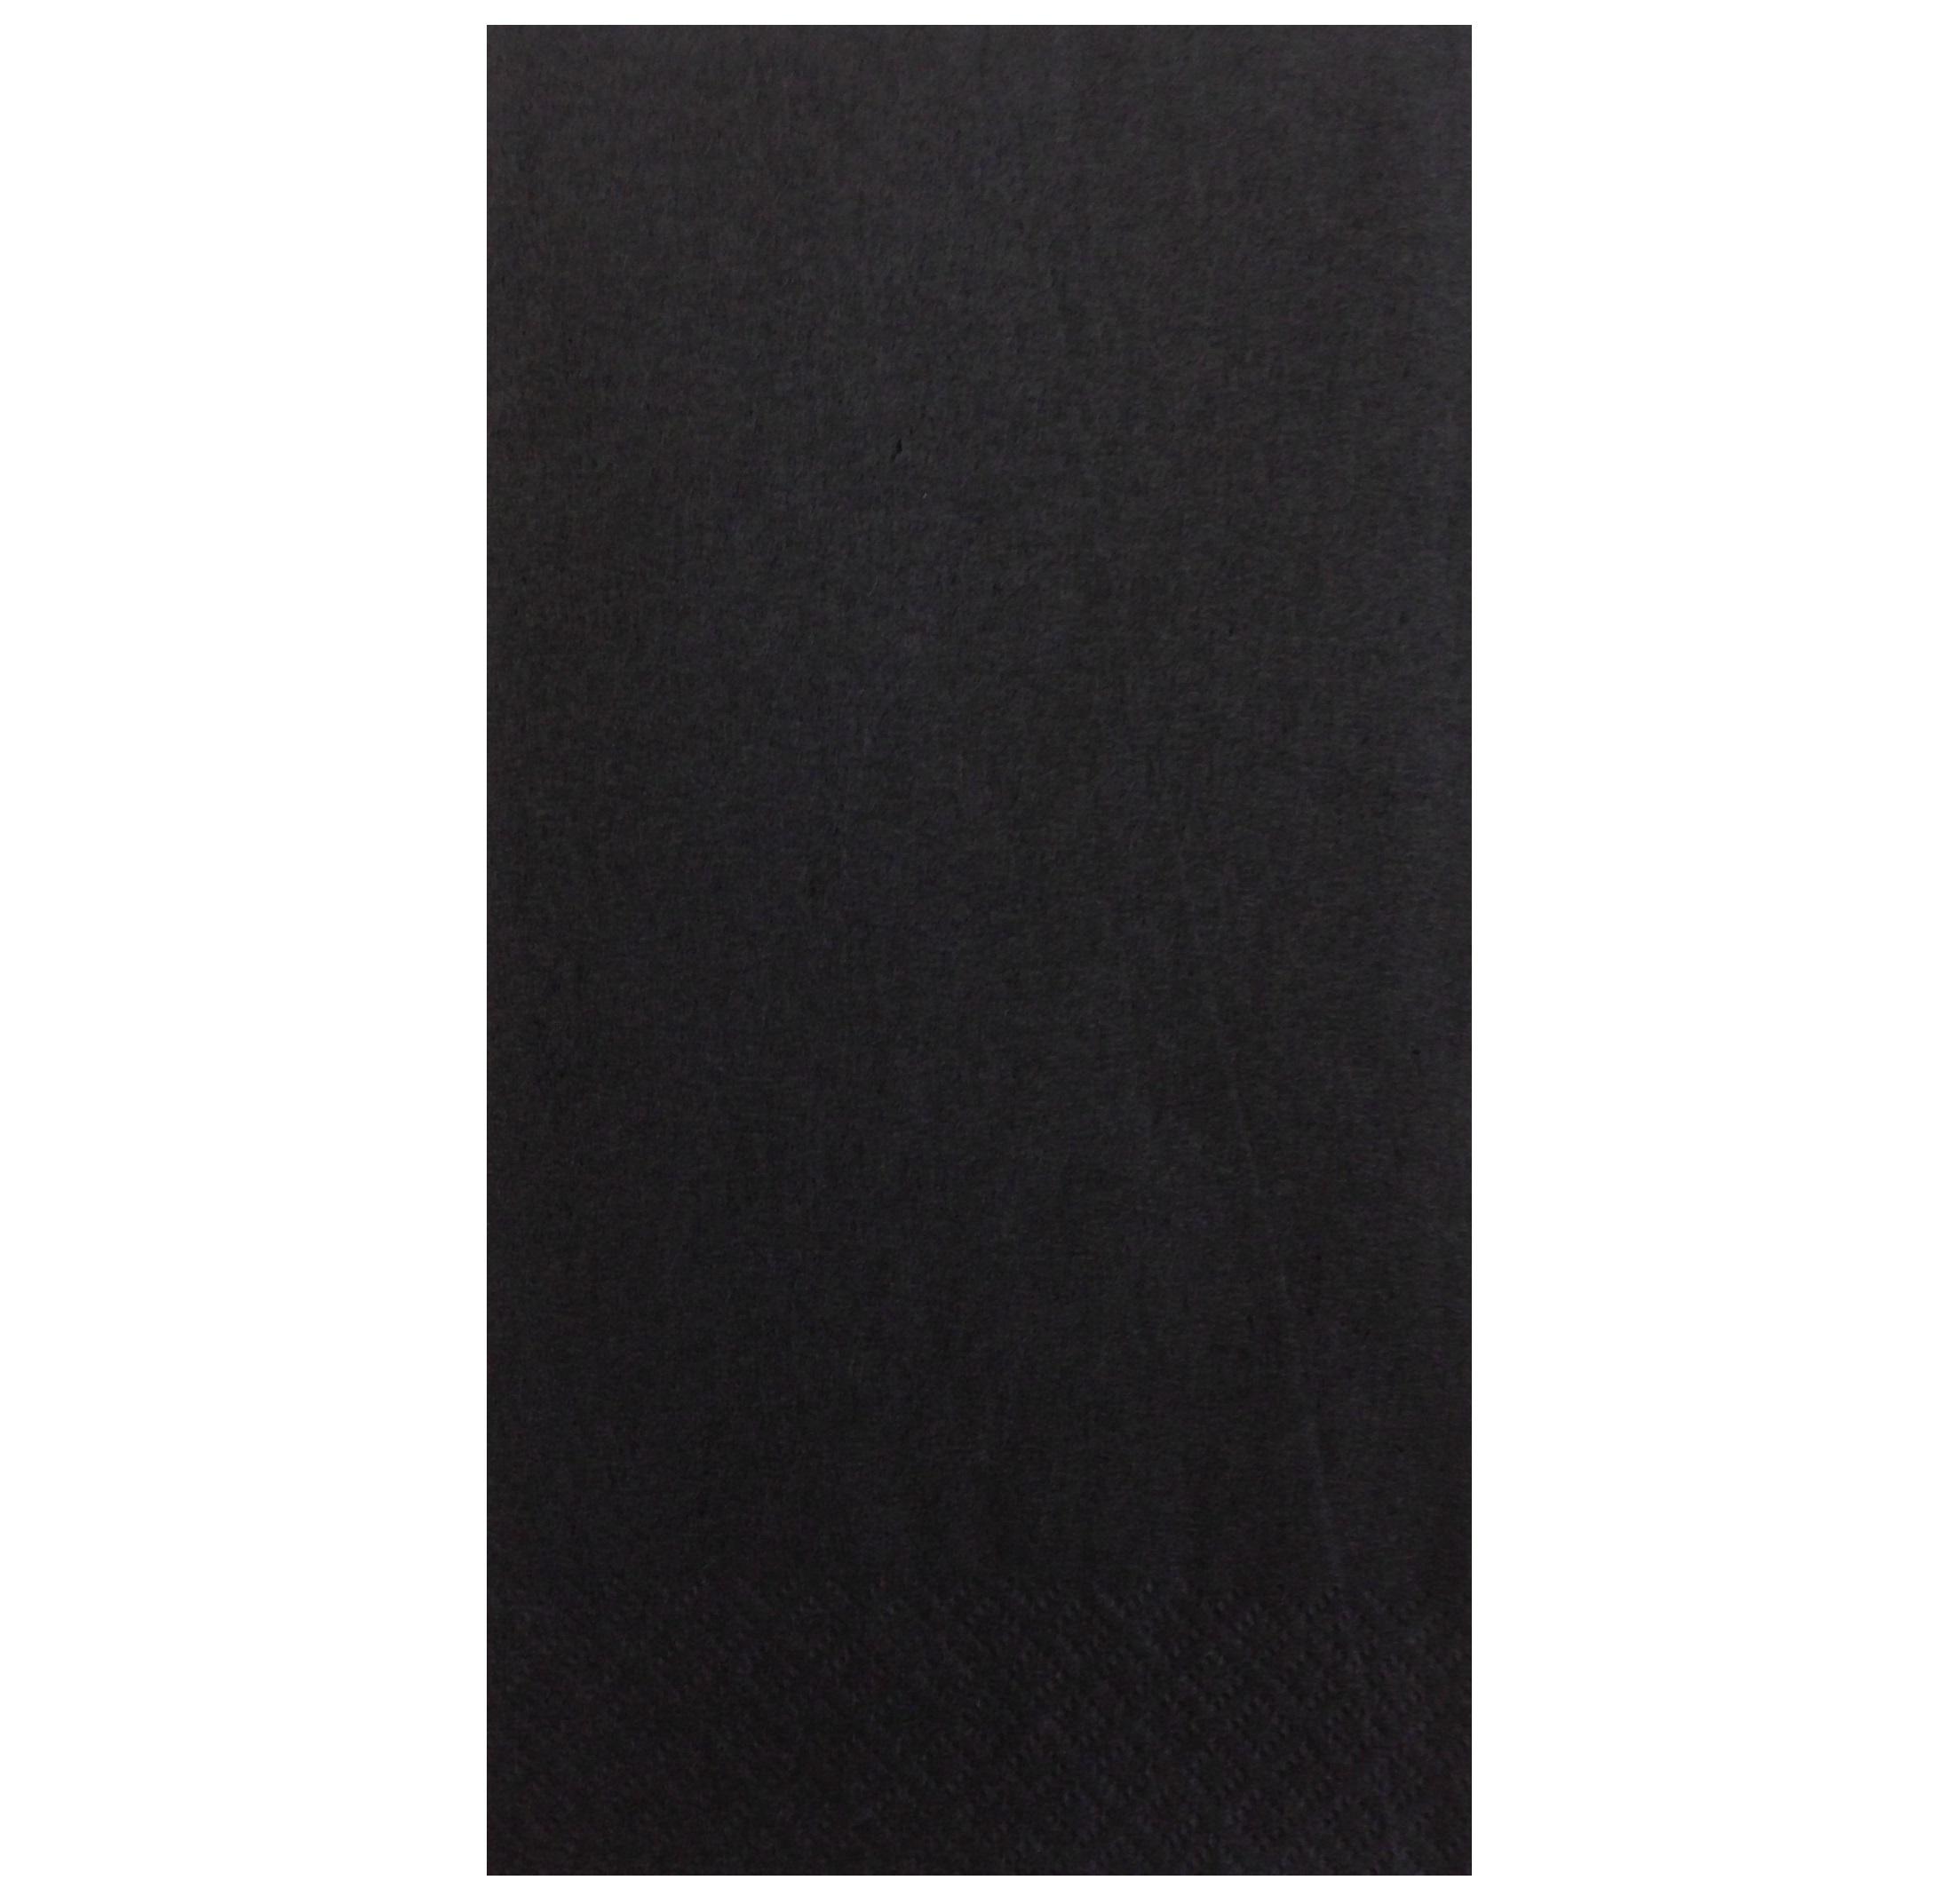 Black-Napkins-40cm-3ply----8-fold--10x100